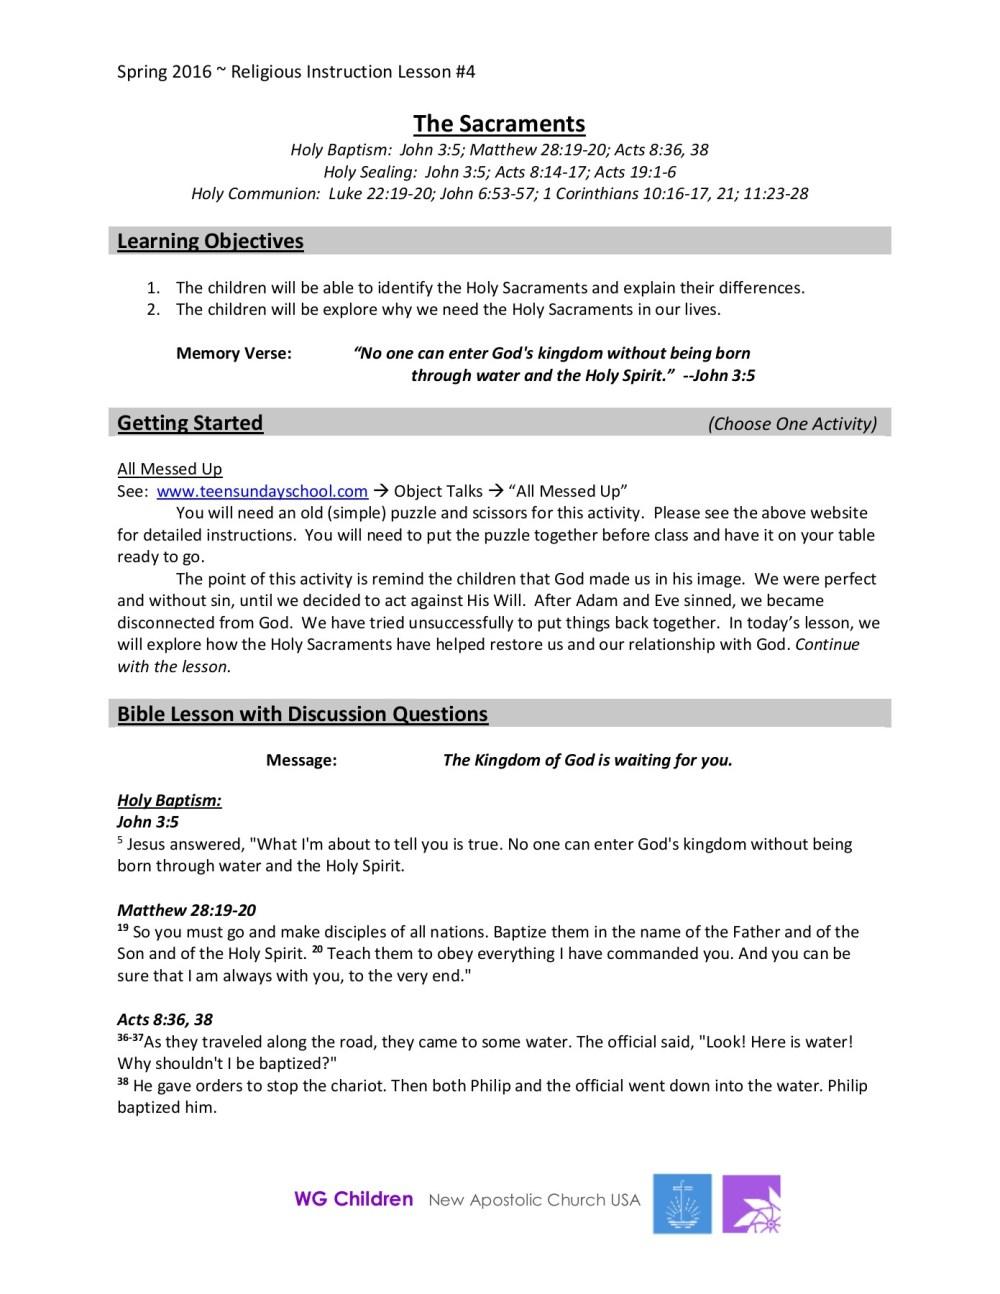 medium resolution of The Sacraments - nac-usa.org-Flip eBook Pages 1 - 5  AnyFlip   AnyFlip